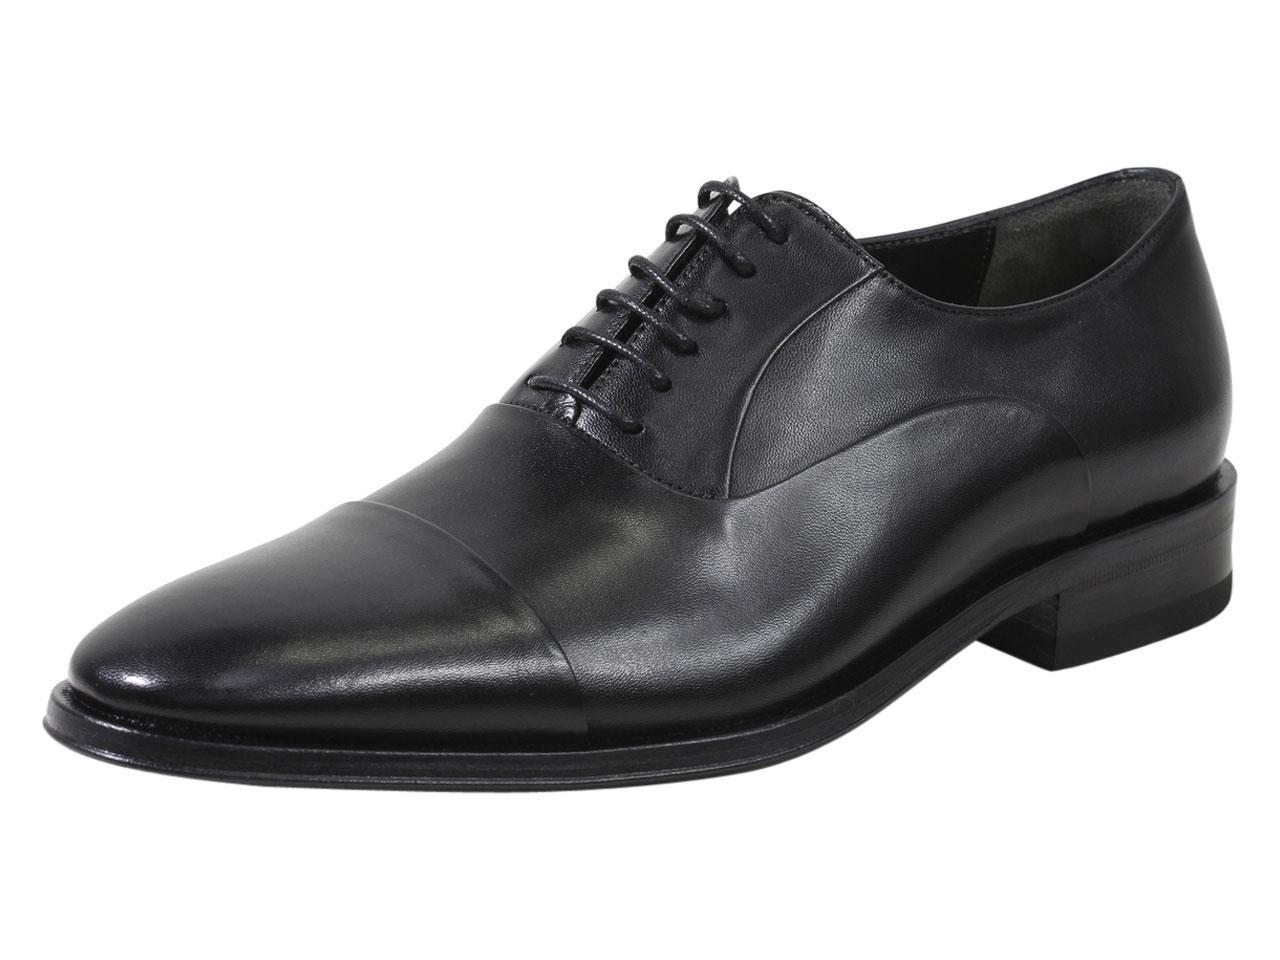 Image of Bruno Magli Men's Maioco Leather Oxfords Shoes - Black - 8.5 D(M) US